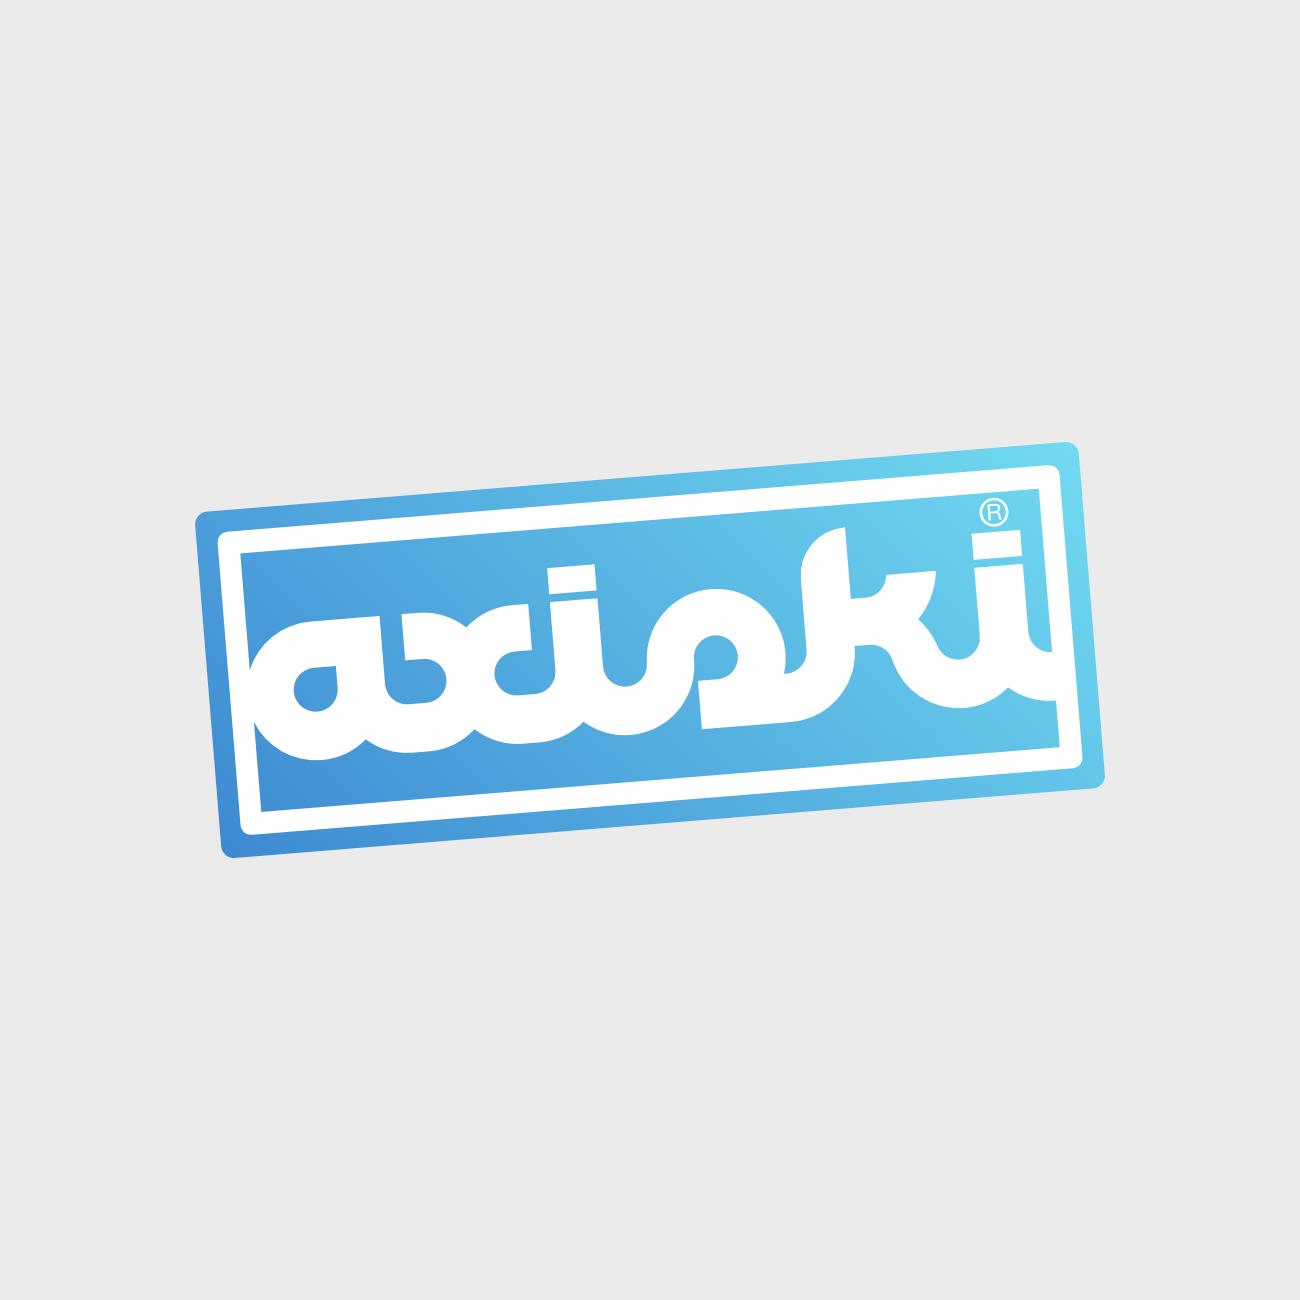 Axiski logo for UK based business